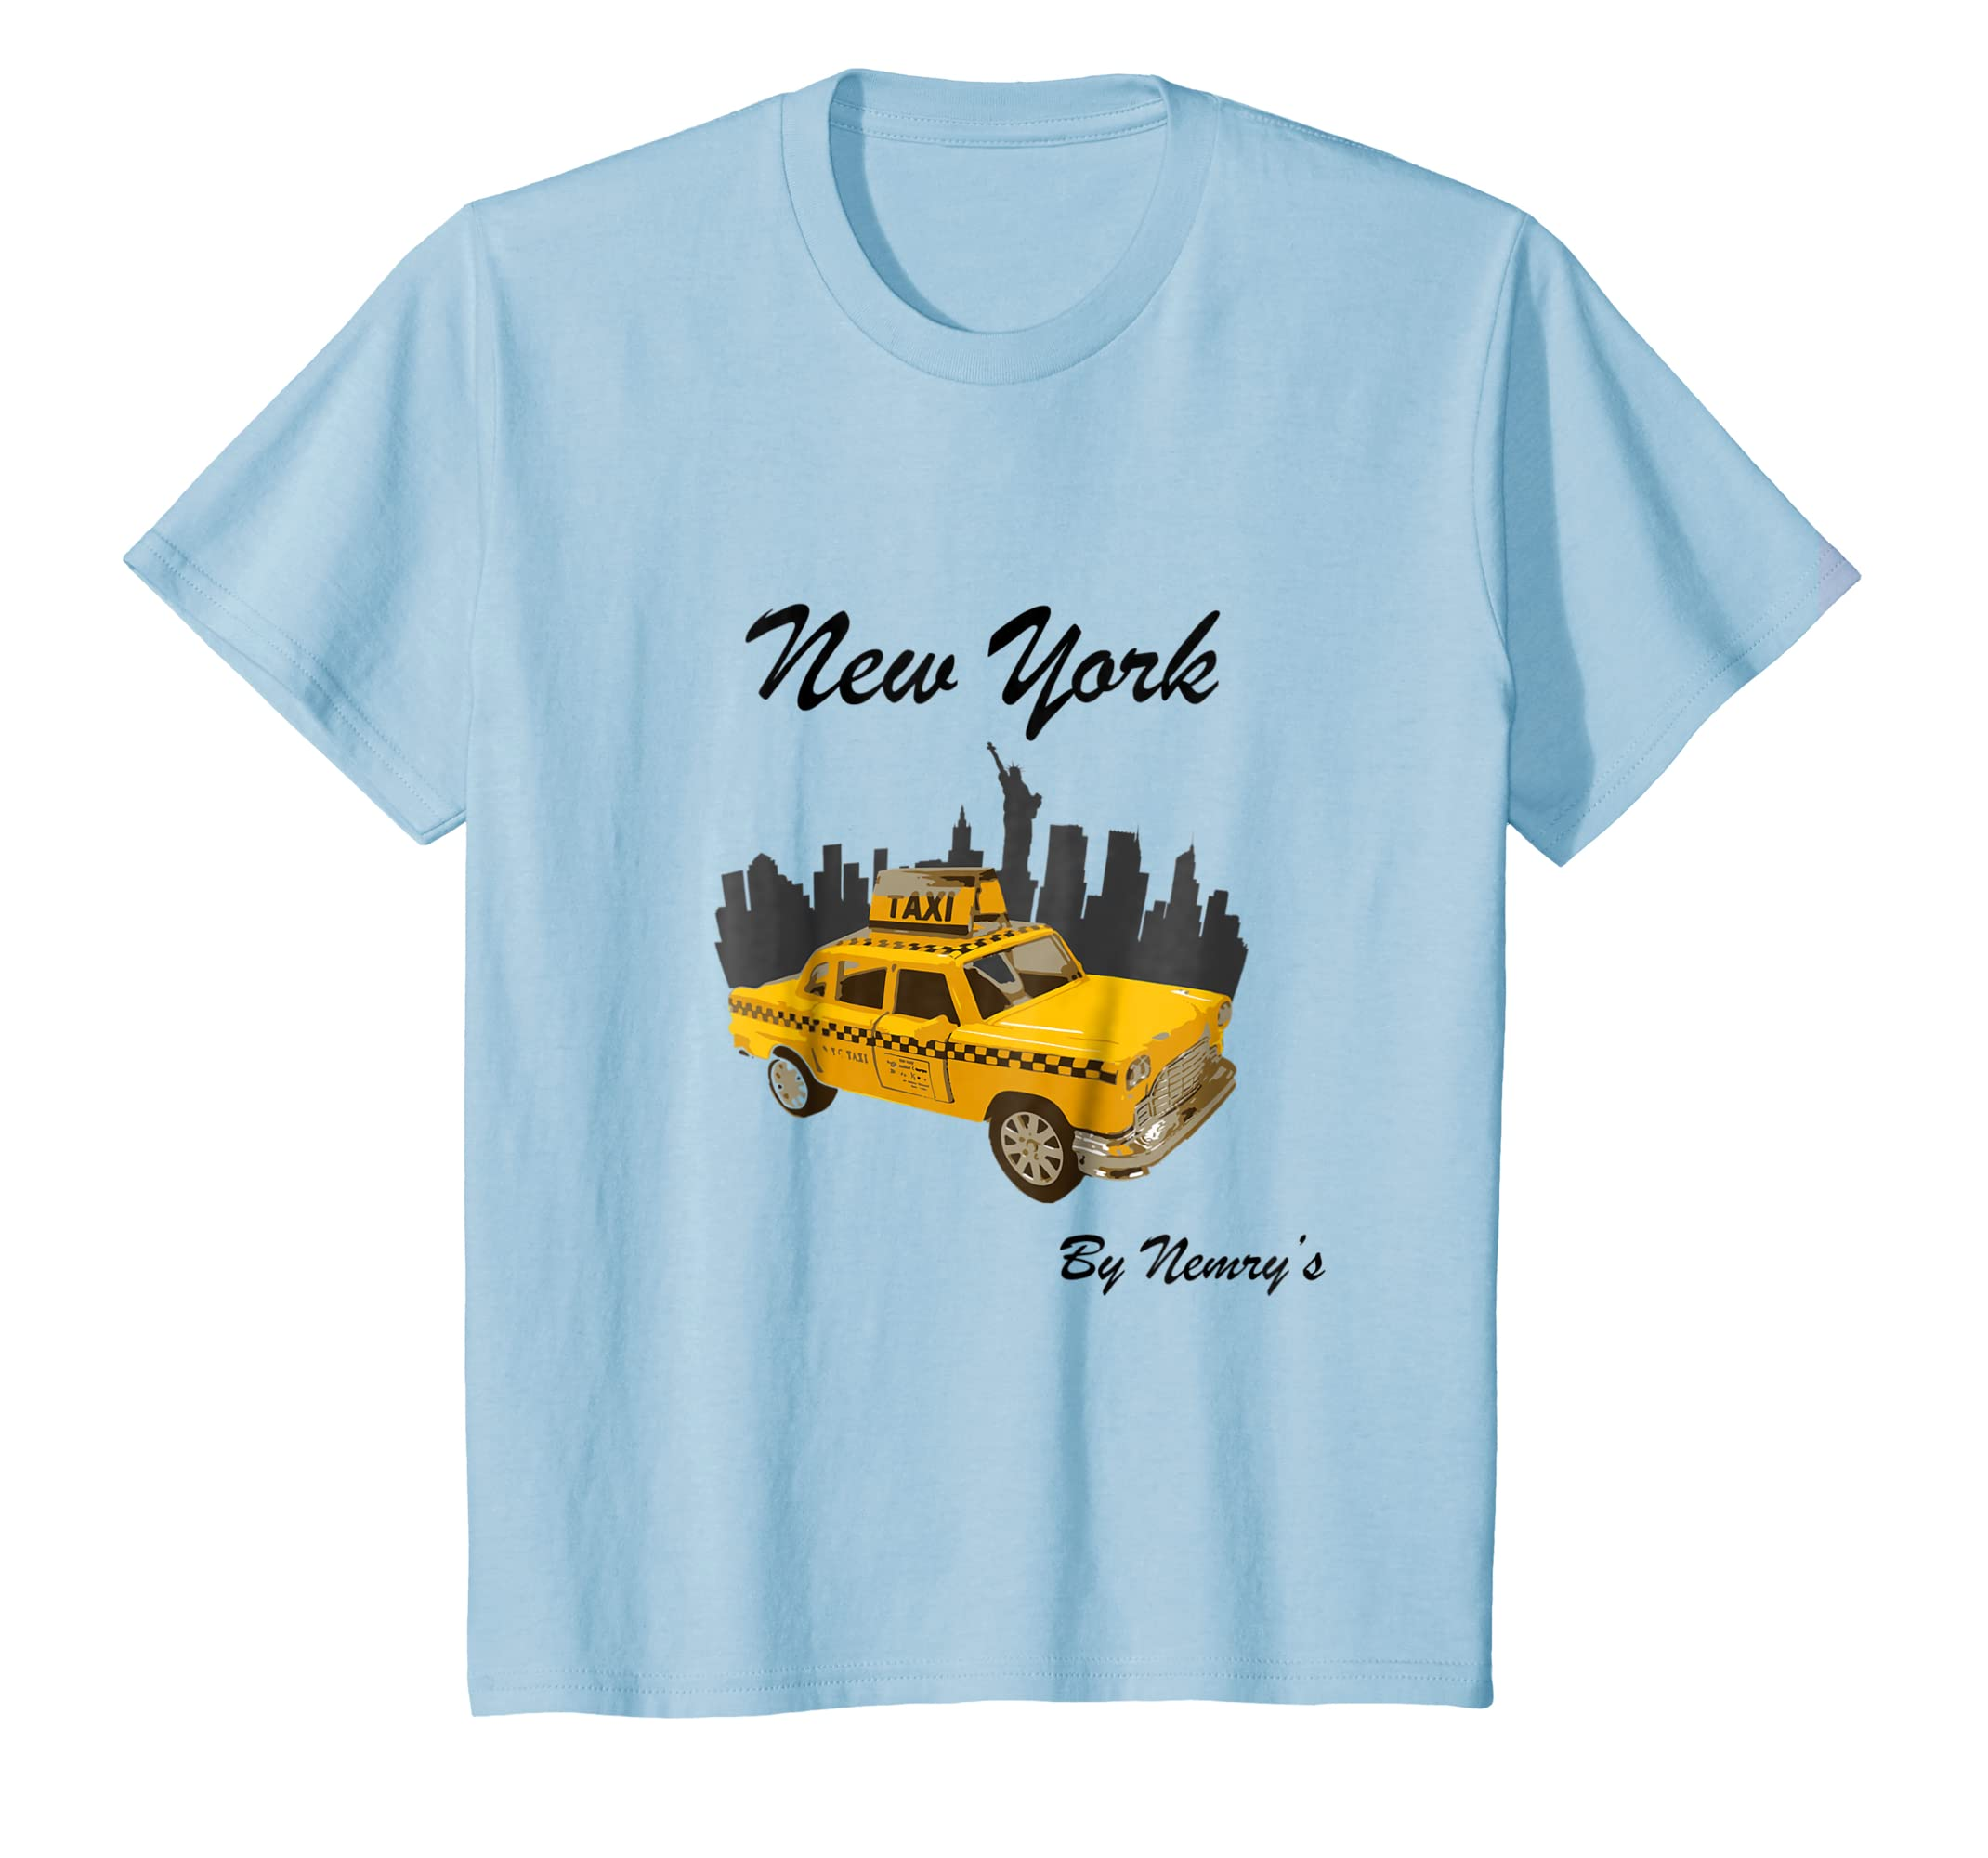 New York Vintage Taxi T Shirts, NYC Cab souvenir tee